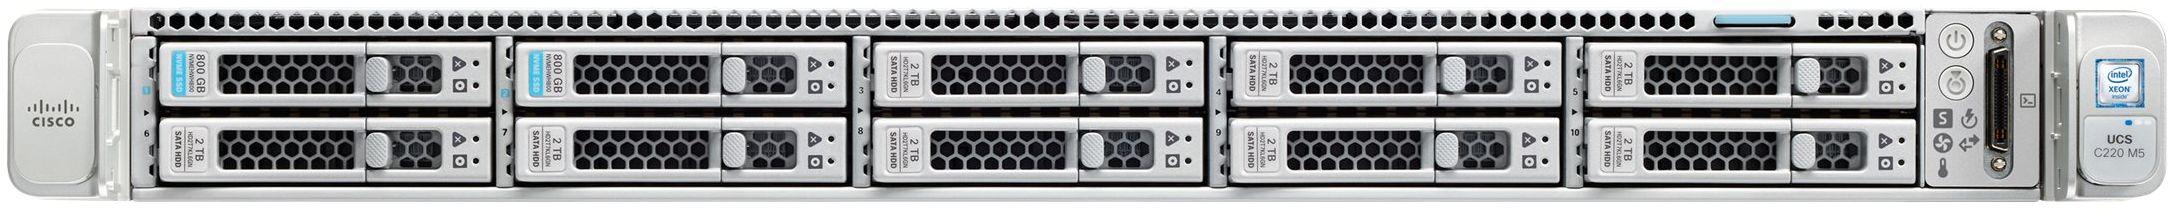 Cisco UCS C220 M5 Front